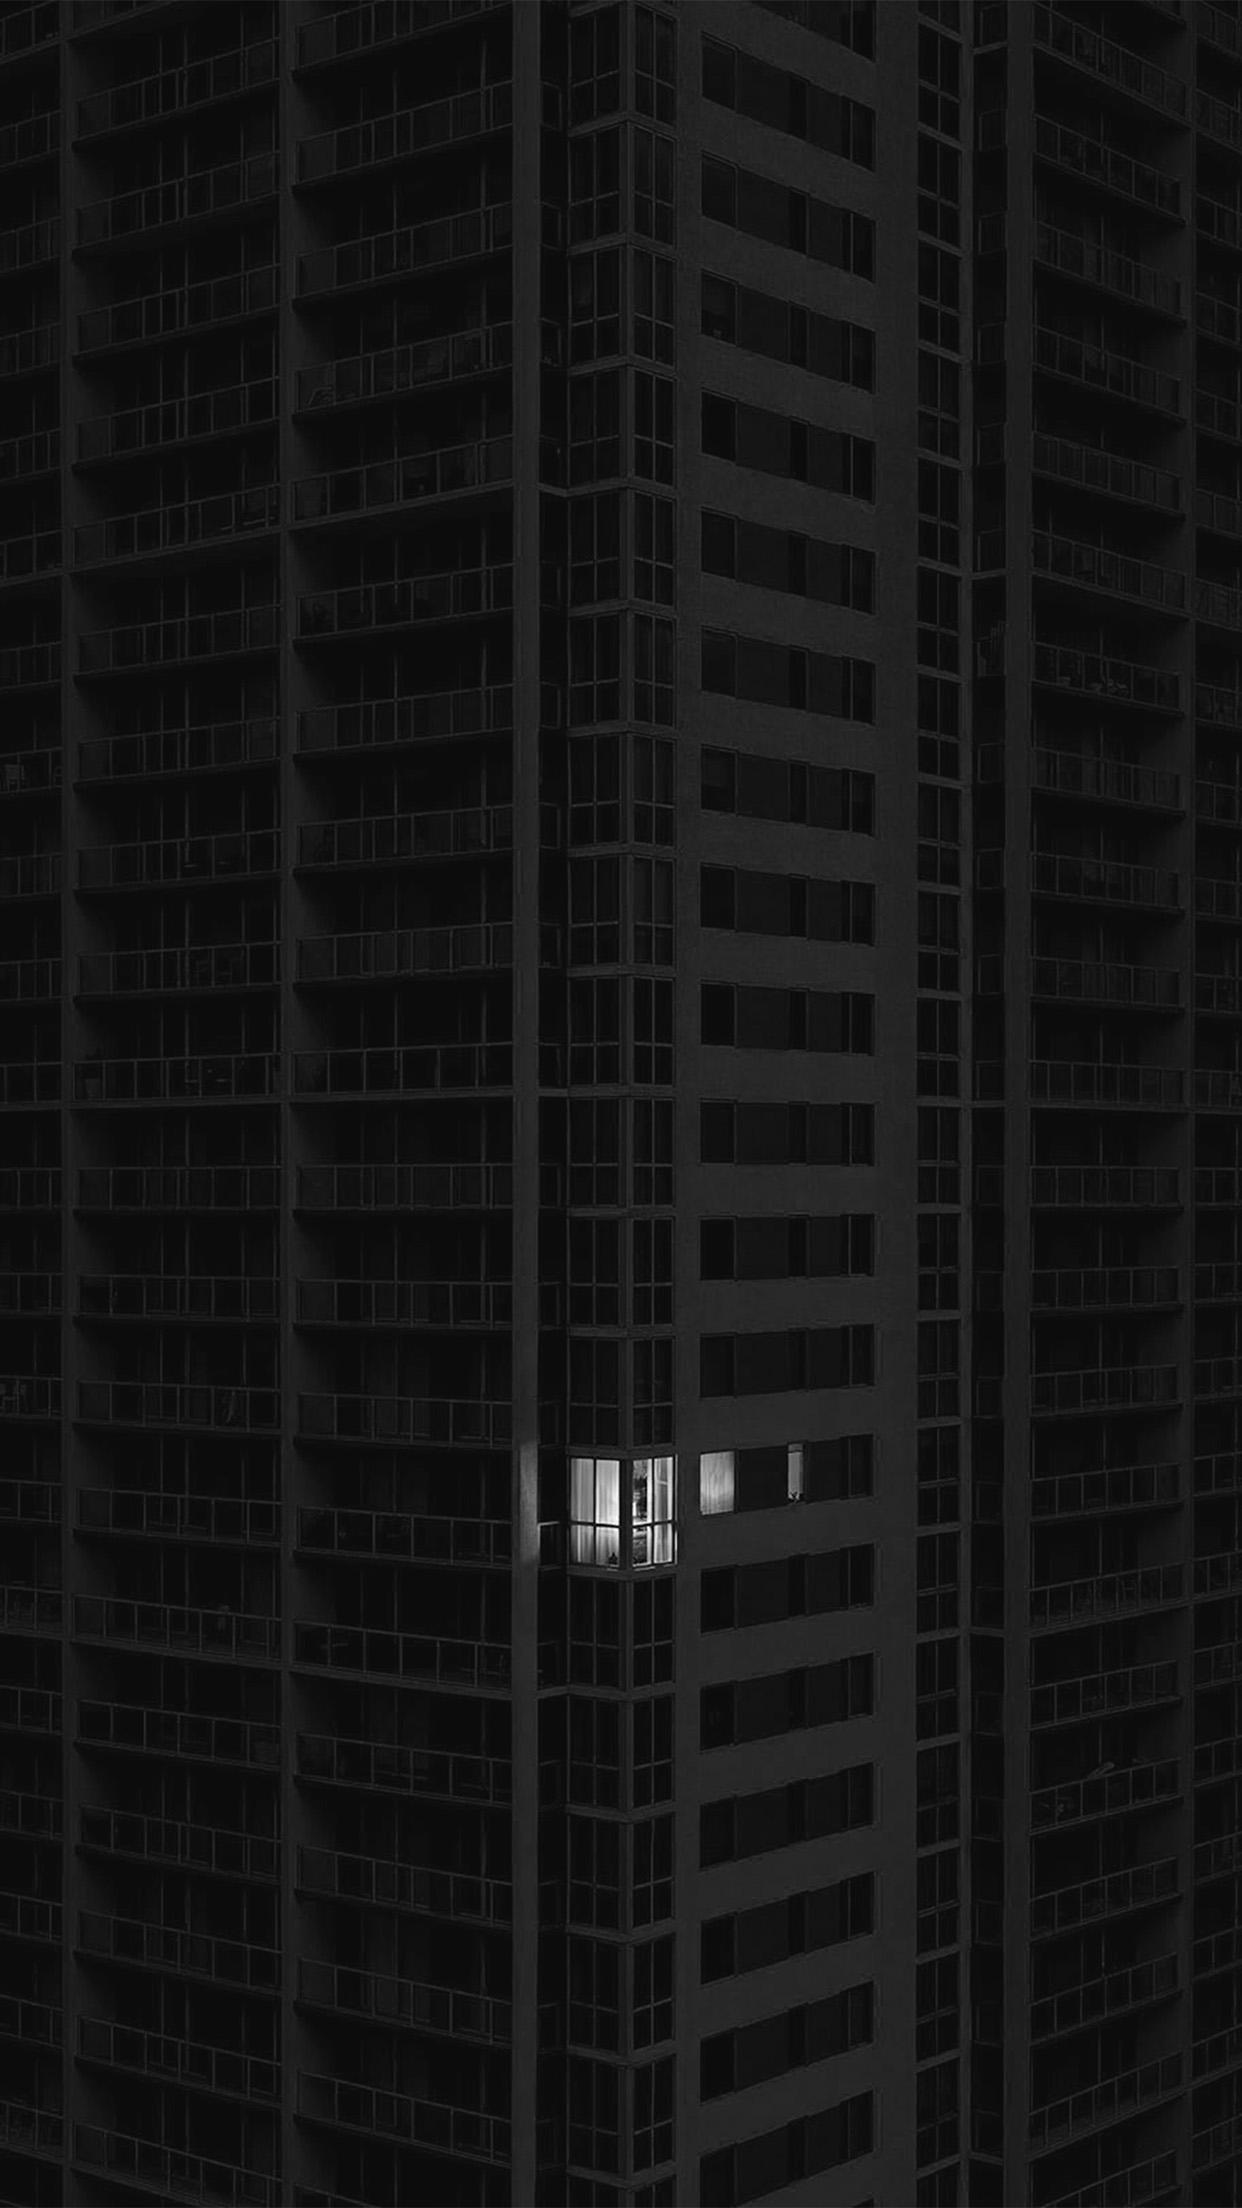 iPhone6papers.com | iPhone 6 wallpaper | bd11-city-dark ...